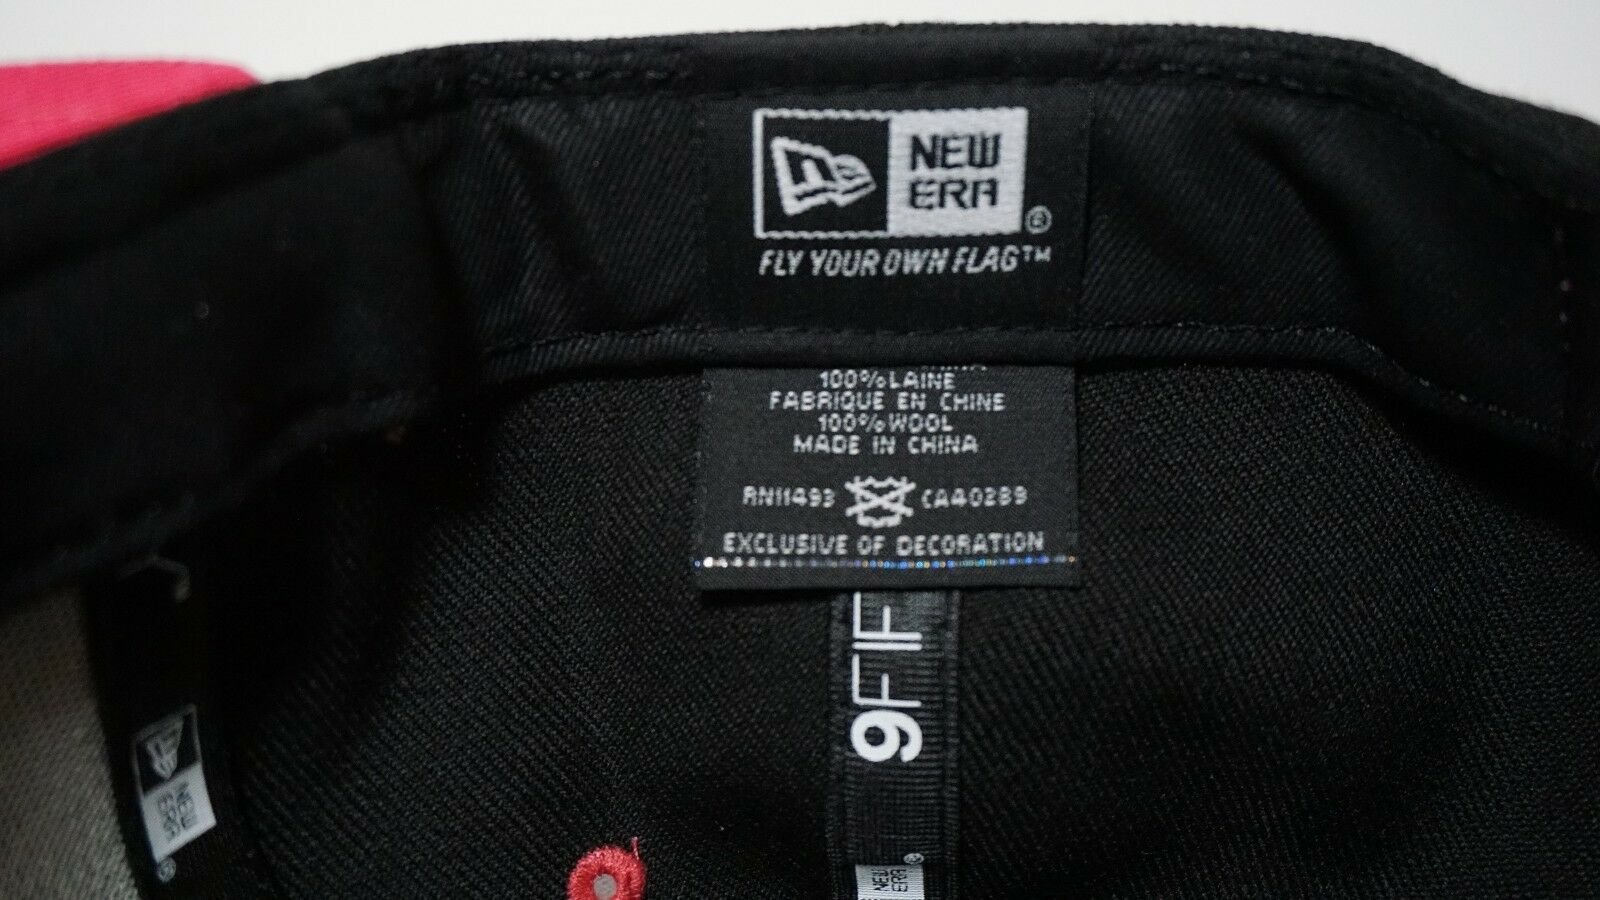 New Era San Antonio Spurs NBA Reflipper 9FIFTY Snapback Cap [Pink/Blk][New]